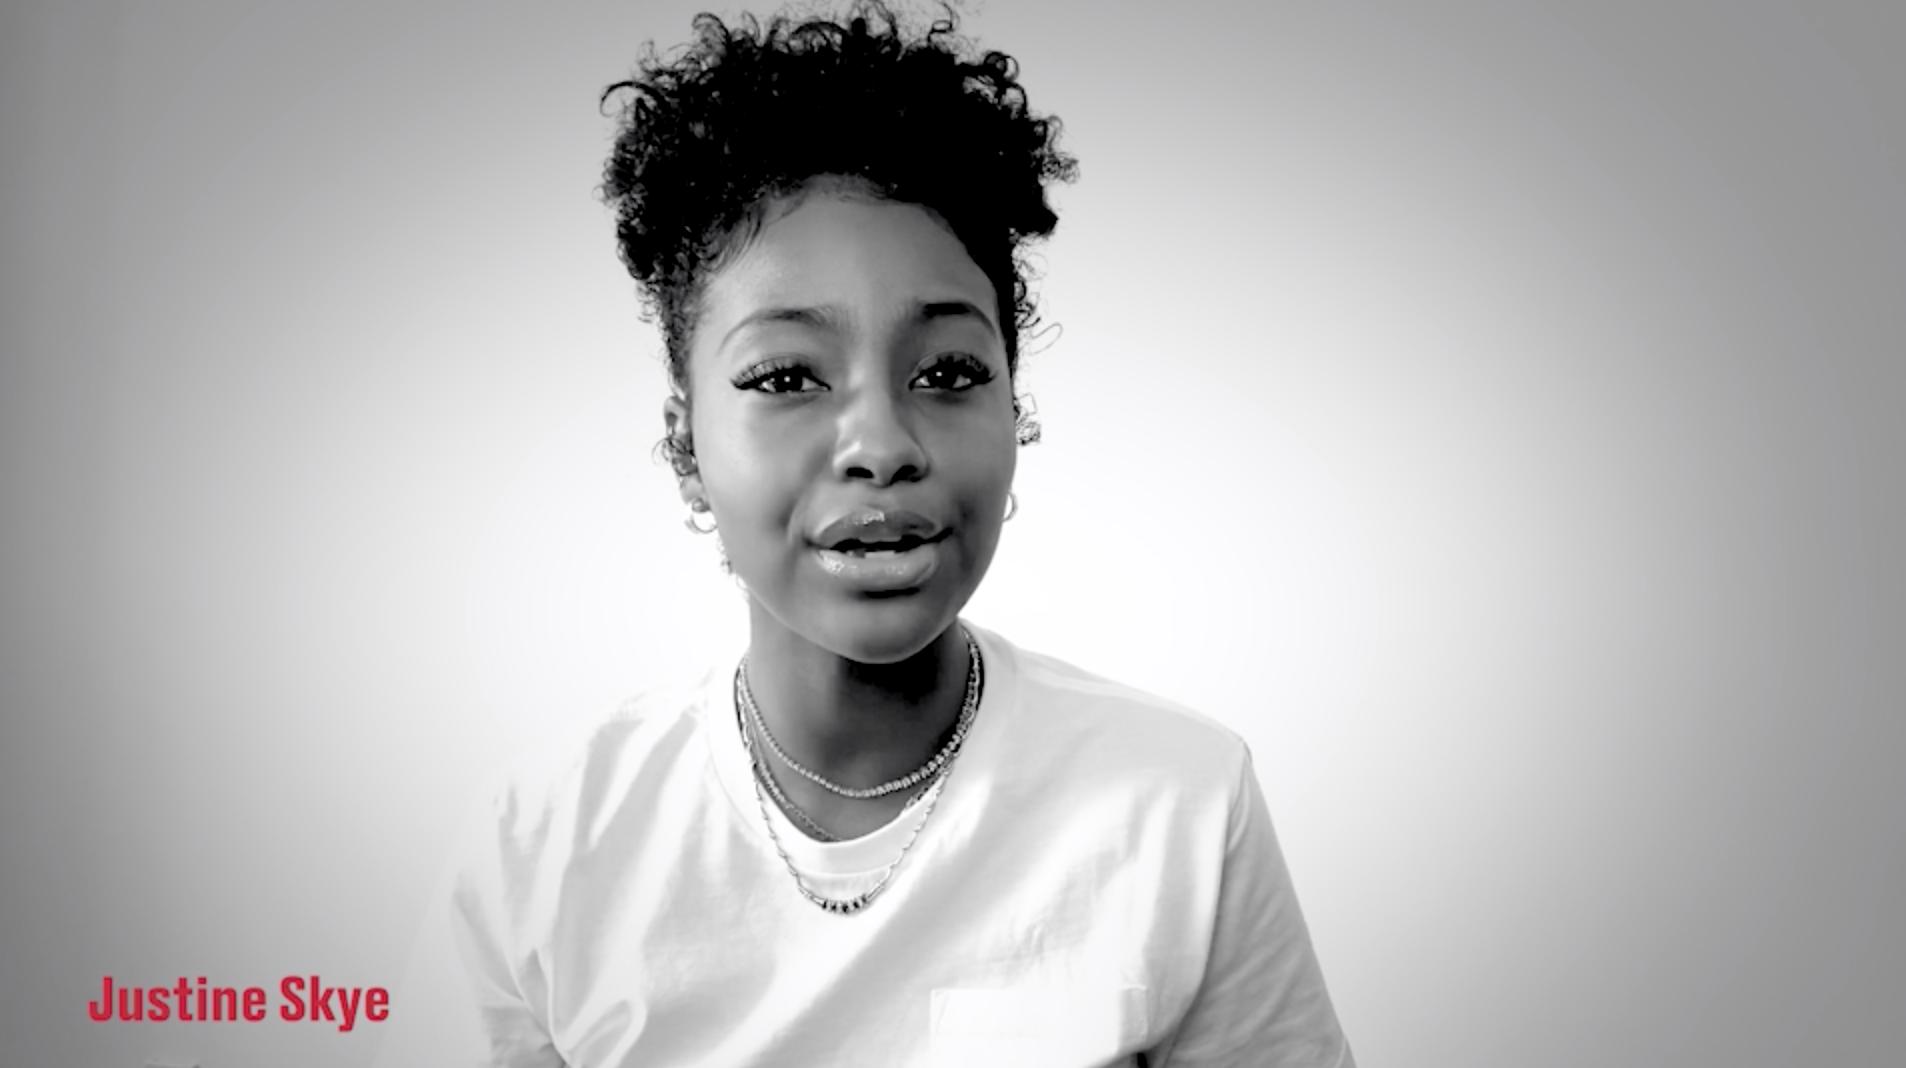 Justine Skye lends voice to Toyota #UsAgainstCovidAd